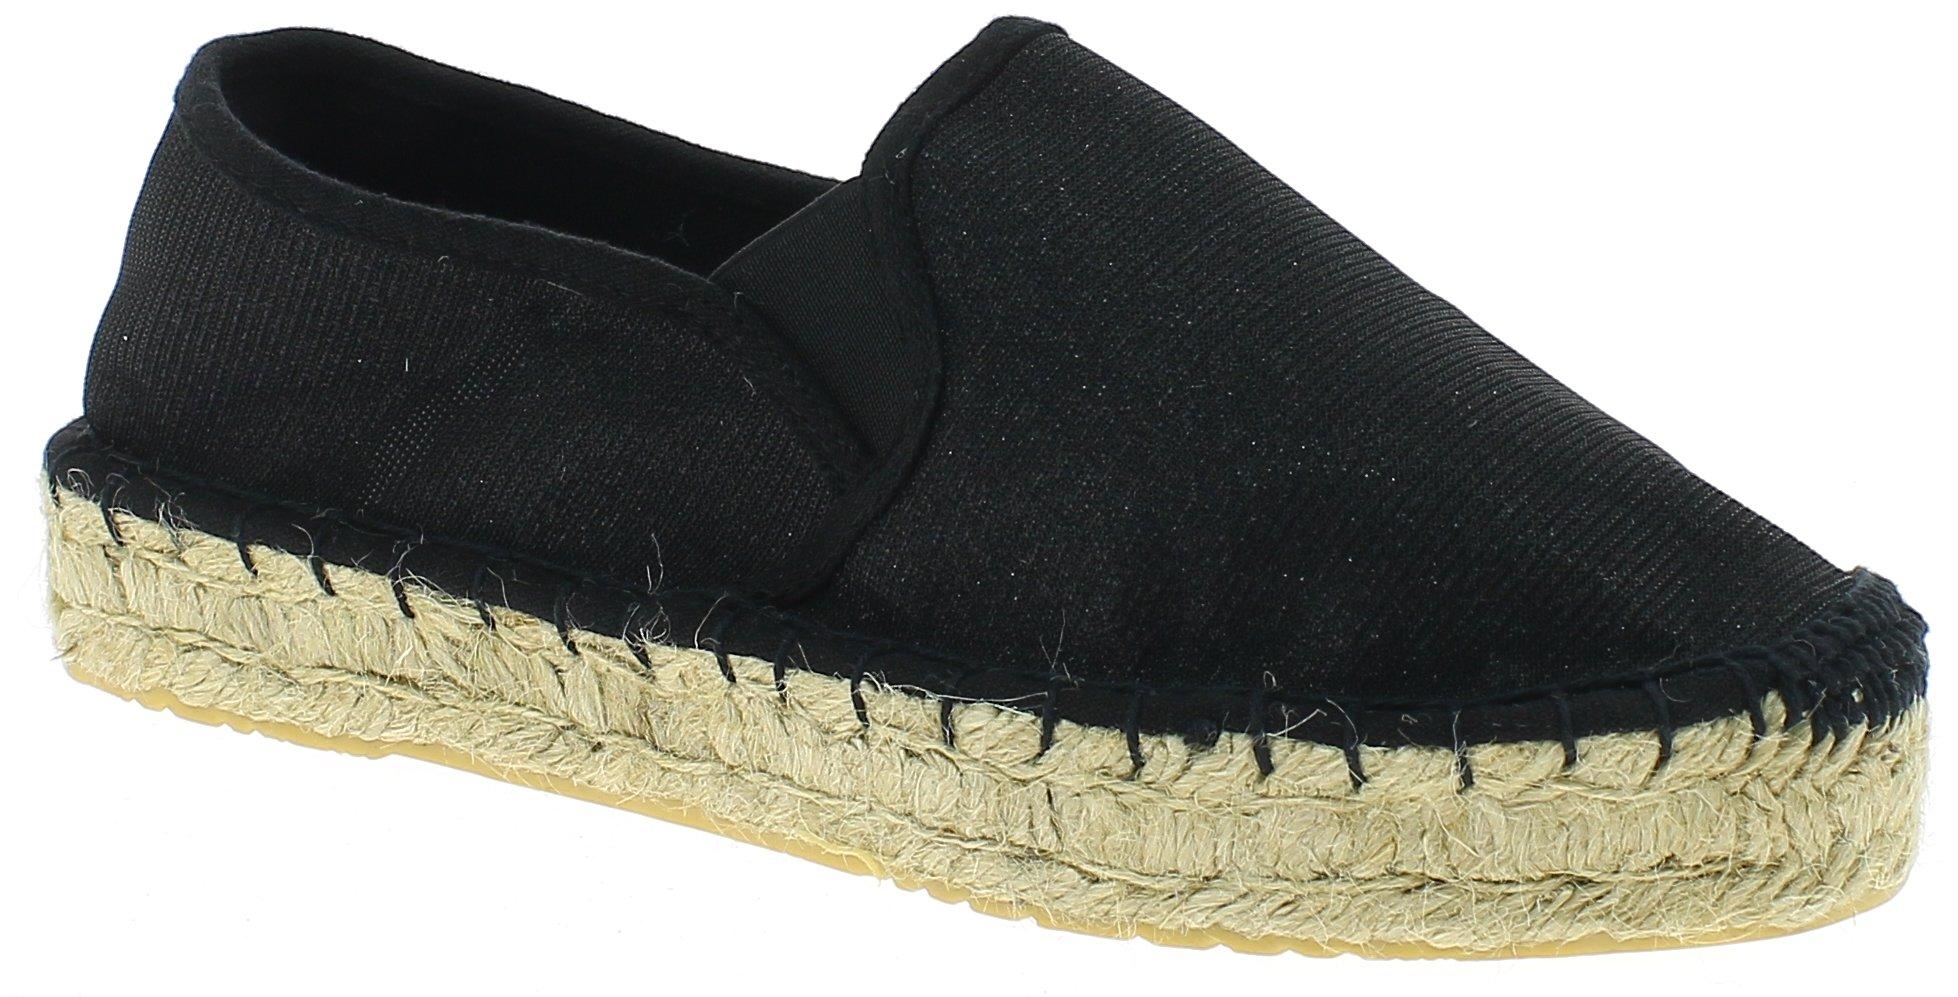 POMPEA Γυναικείο Casual LITA 213 Μαύρο - IqShoes - LITA 213 BLACK-black-39/1/15/ παπούτσια  προσφορεσ